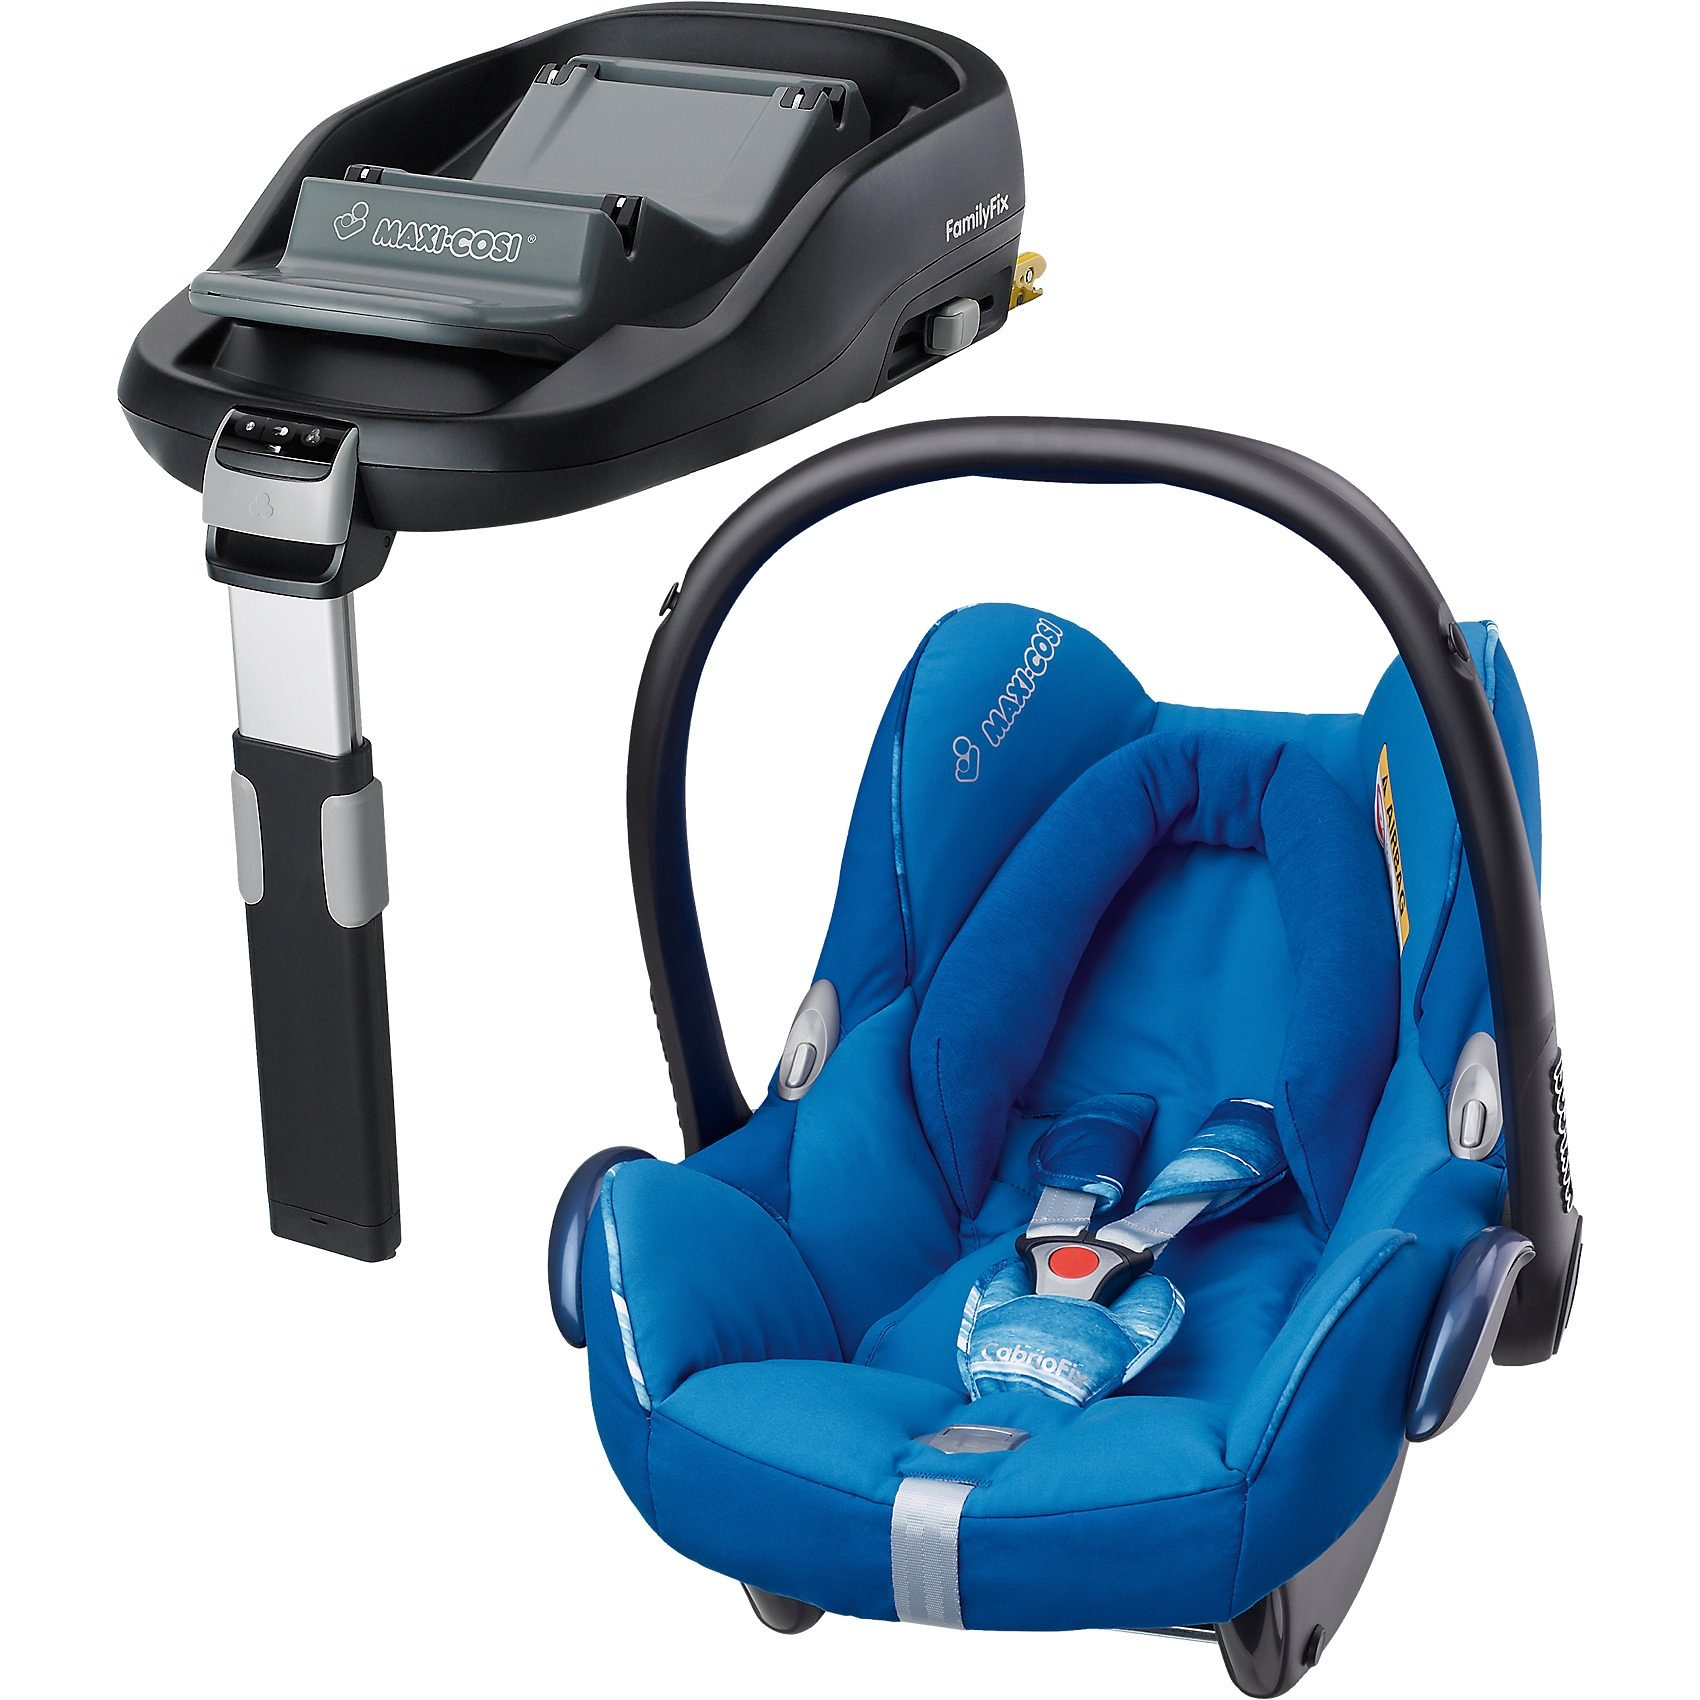 Maxi-Cosi Babyschale Cabriofix, watercolur blue, inkl. FamilyFix